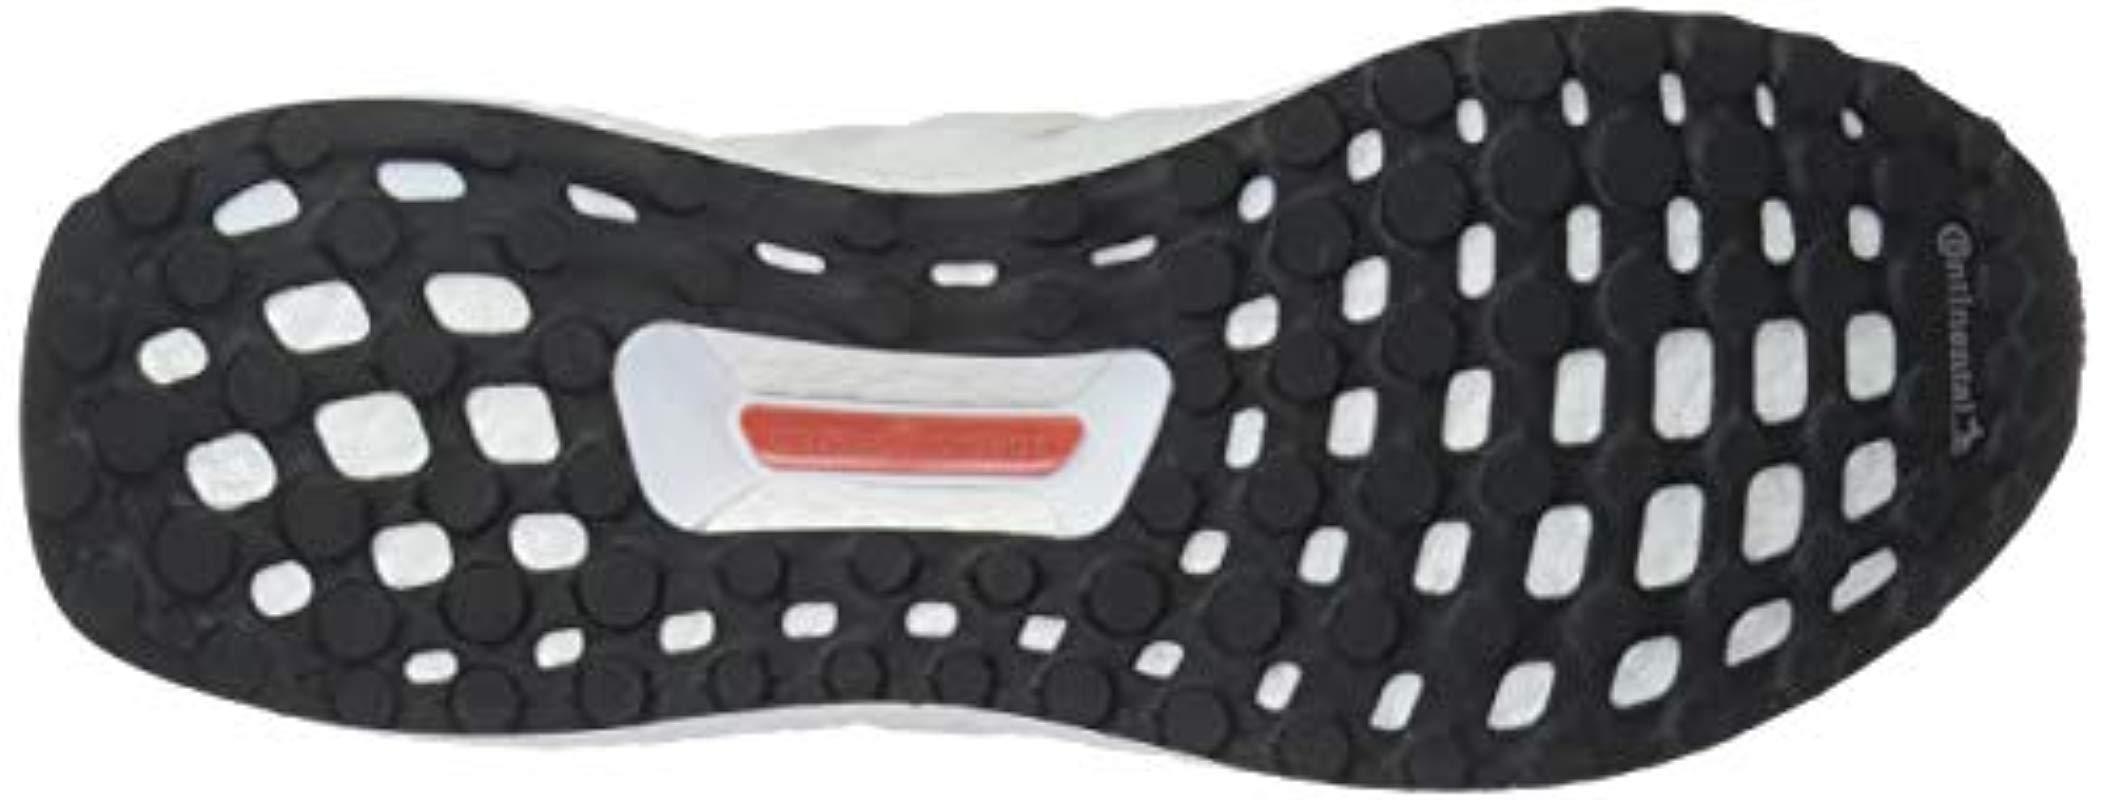 quality design 2b392 c3a89 Adidas White Ultraboost 4.0